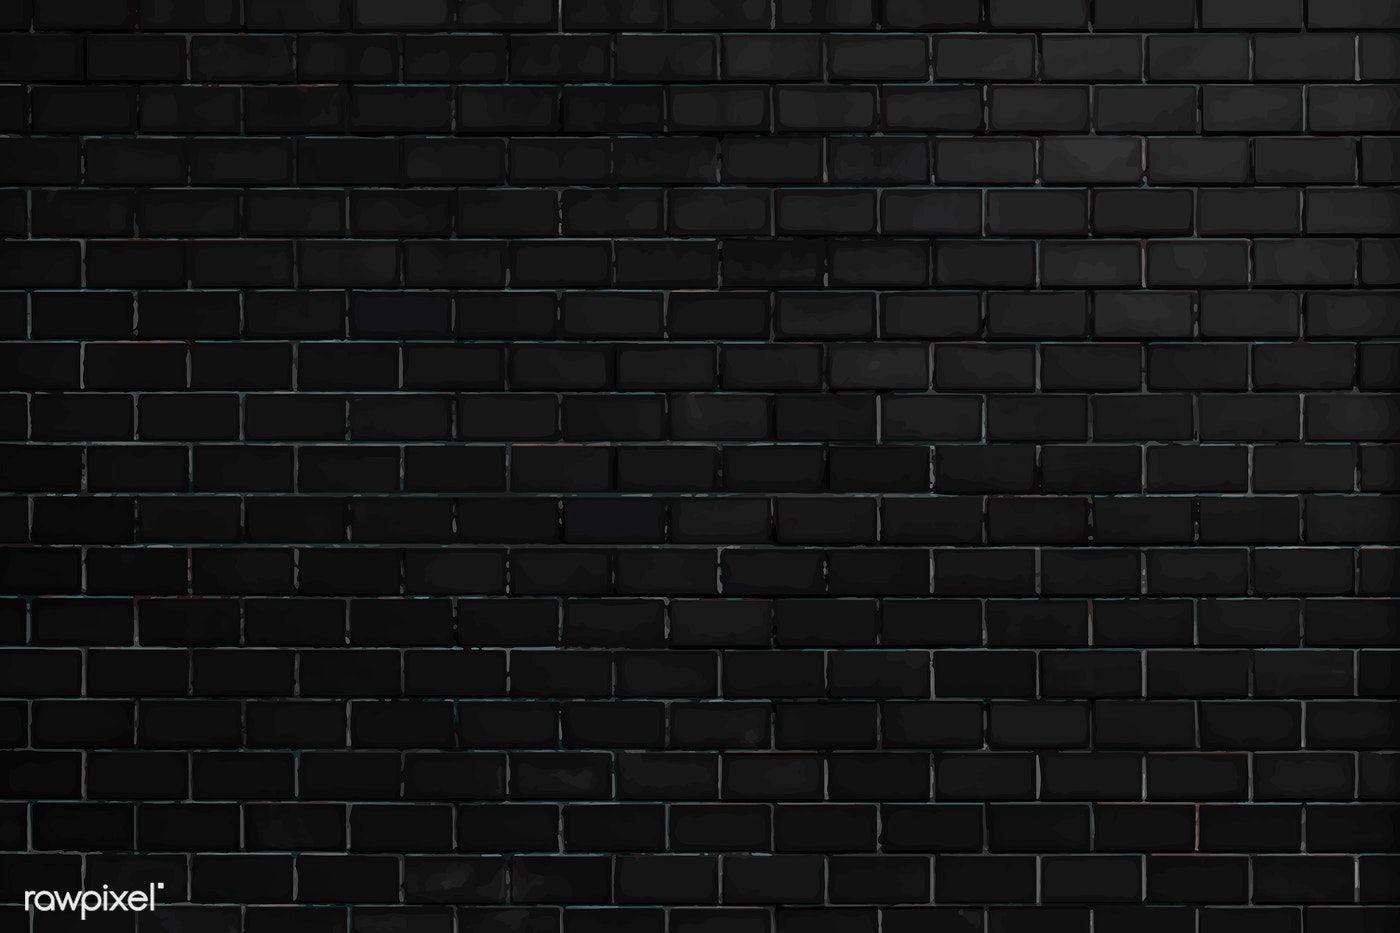 Black Brick Wall Textured Background Free Image By Rawpixel Com Black Brick Wall Black Brick Textured Background